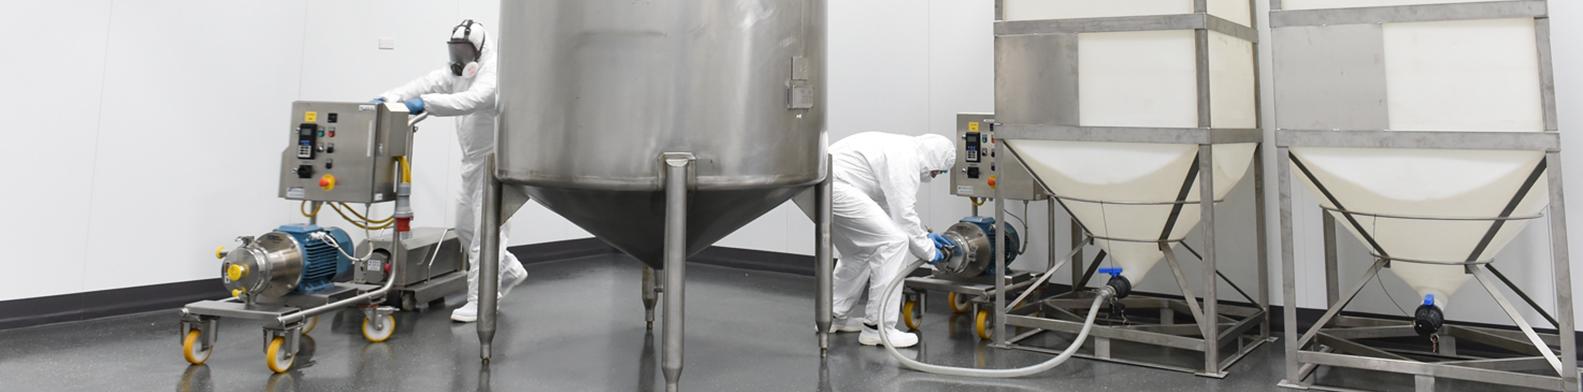 Custom manufacturing